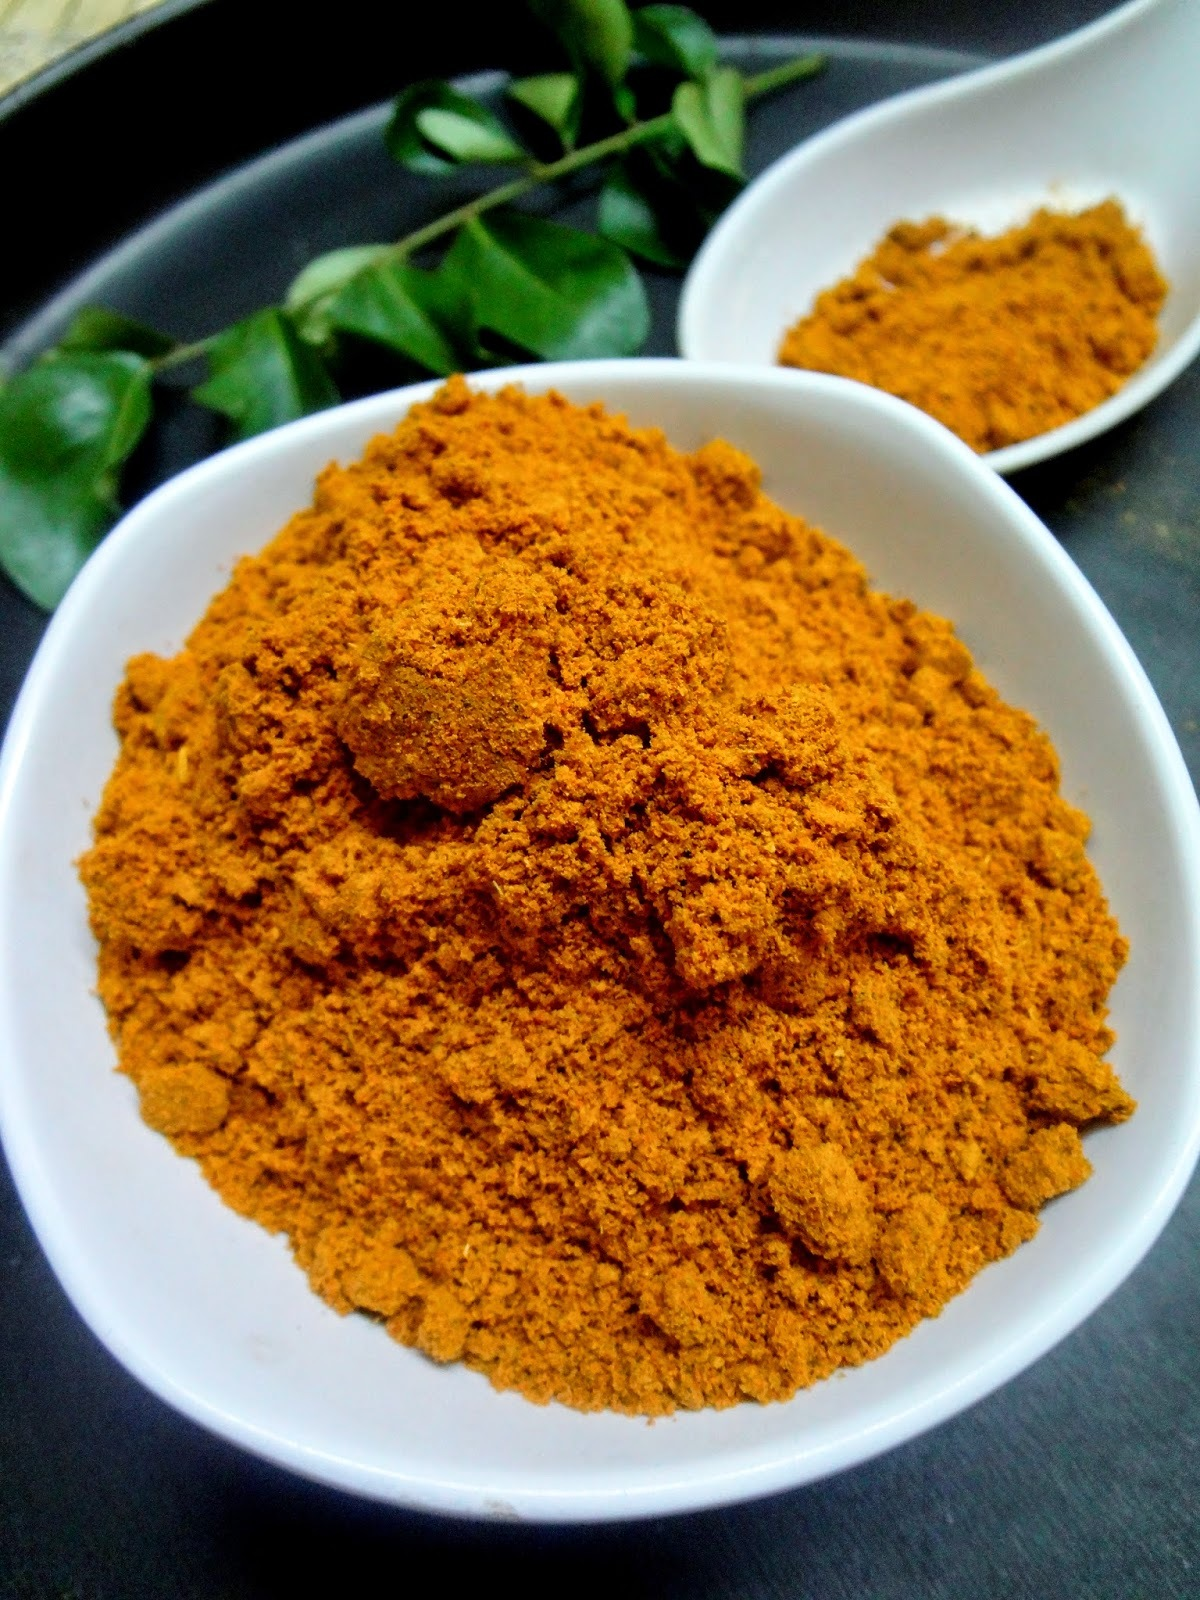 Curry Masala powder for Poriyals and dry sabjis